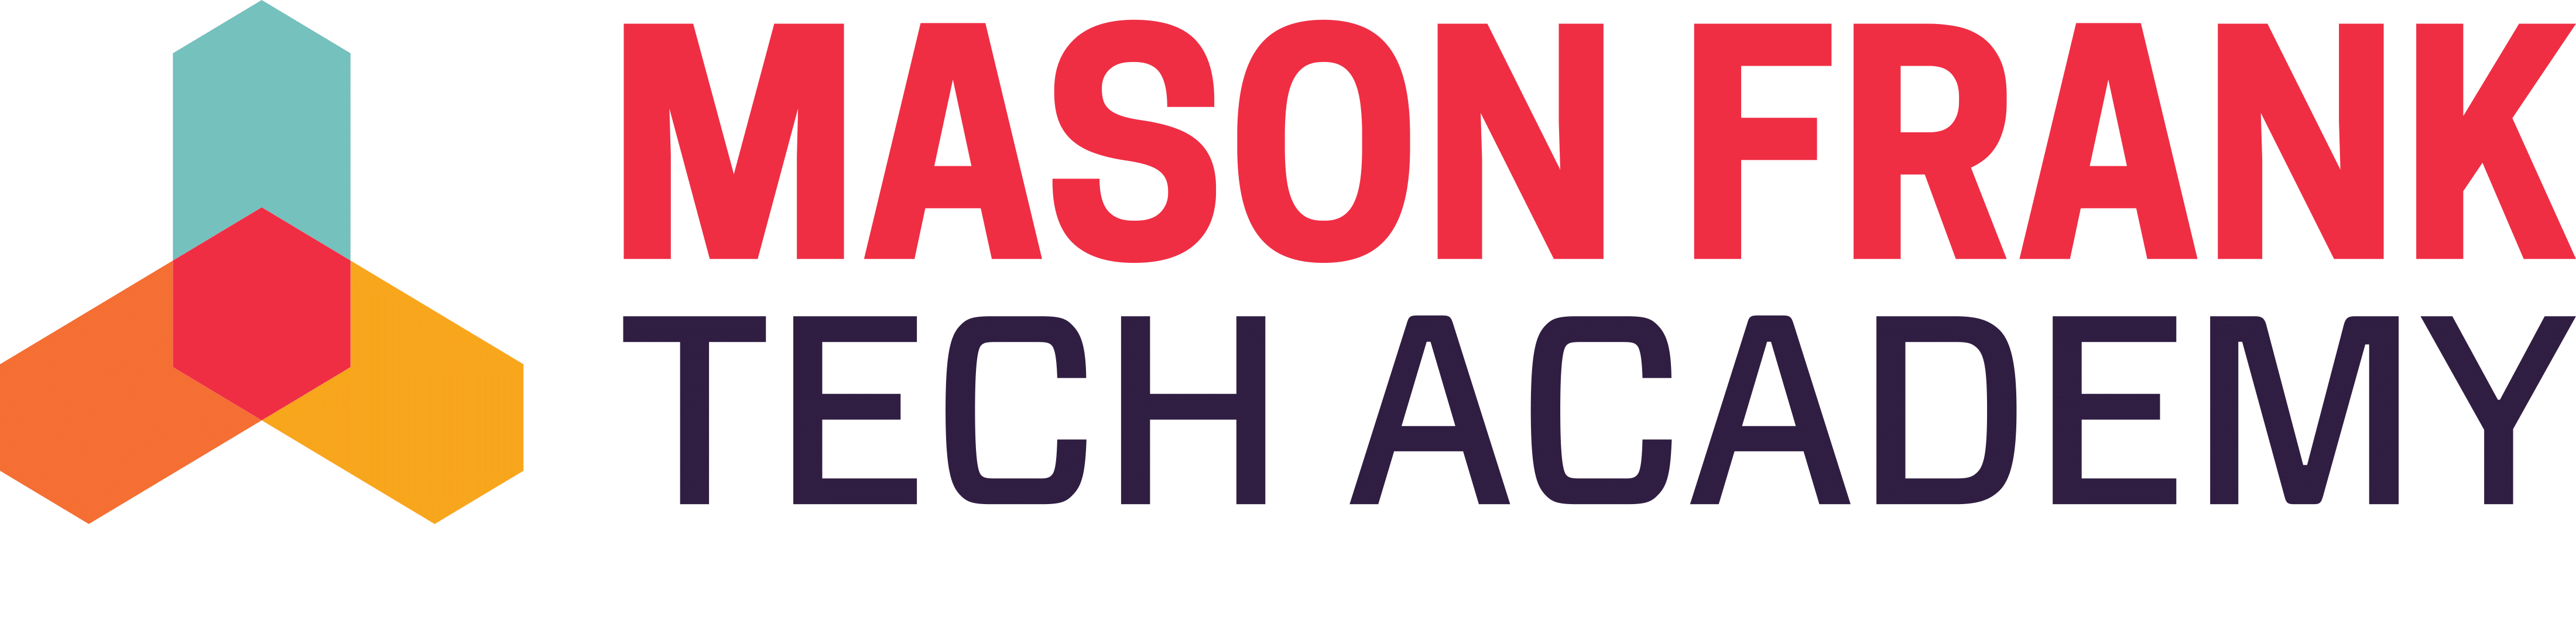 Mason Frank Tech Academy